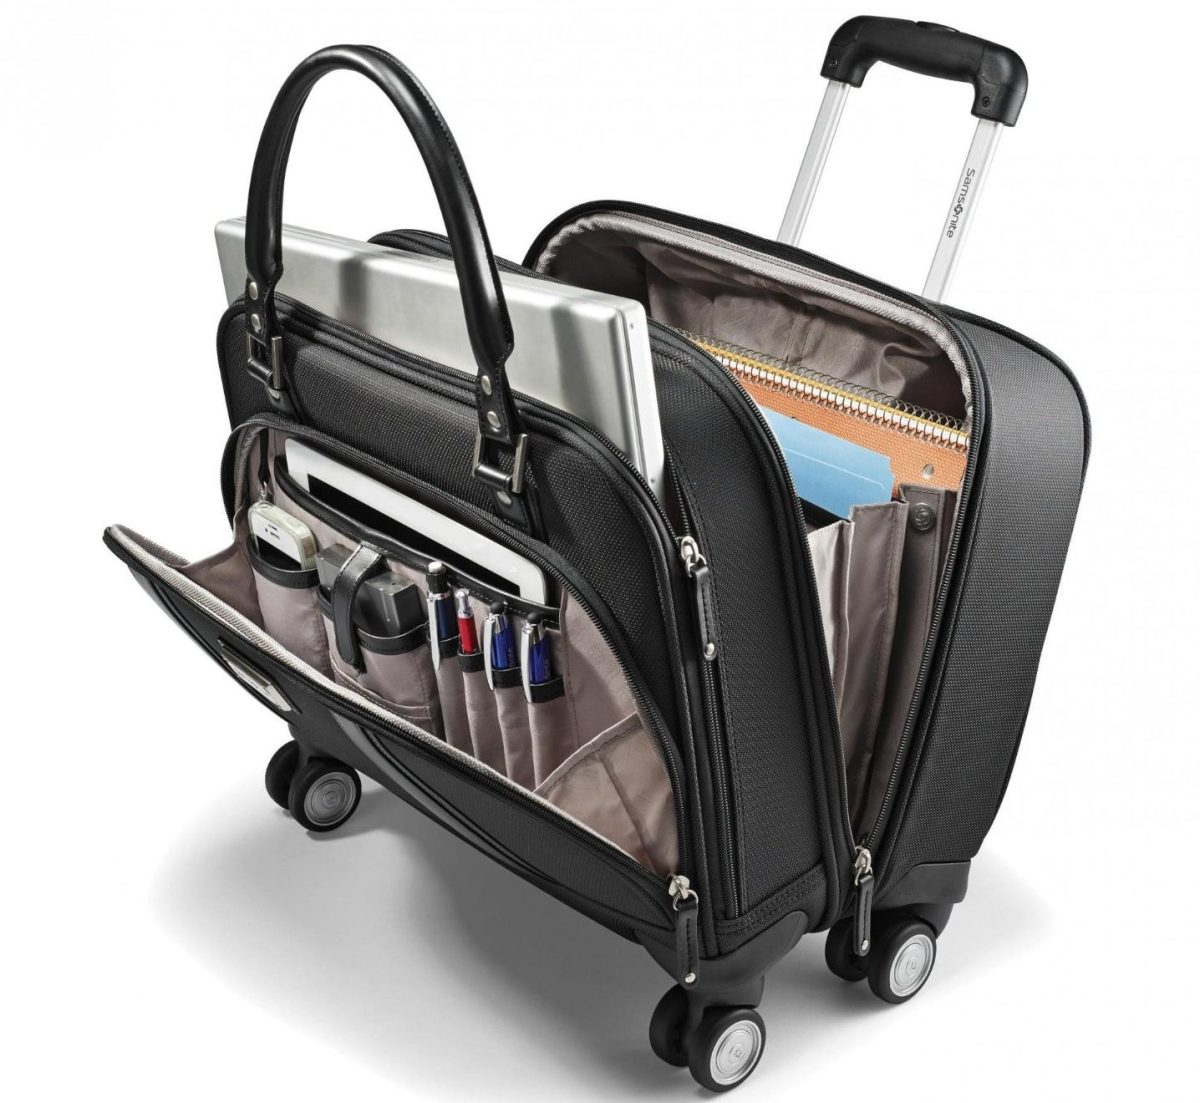 Best Briefcase on Wheels for Women